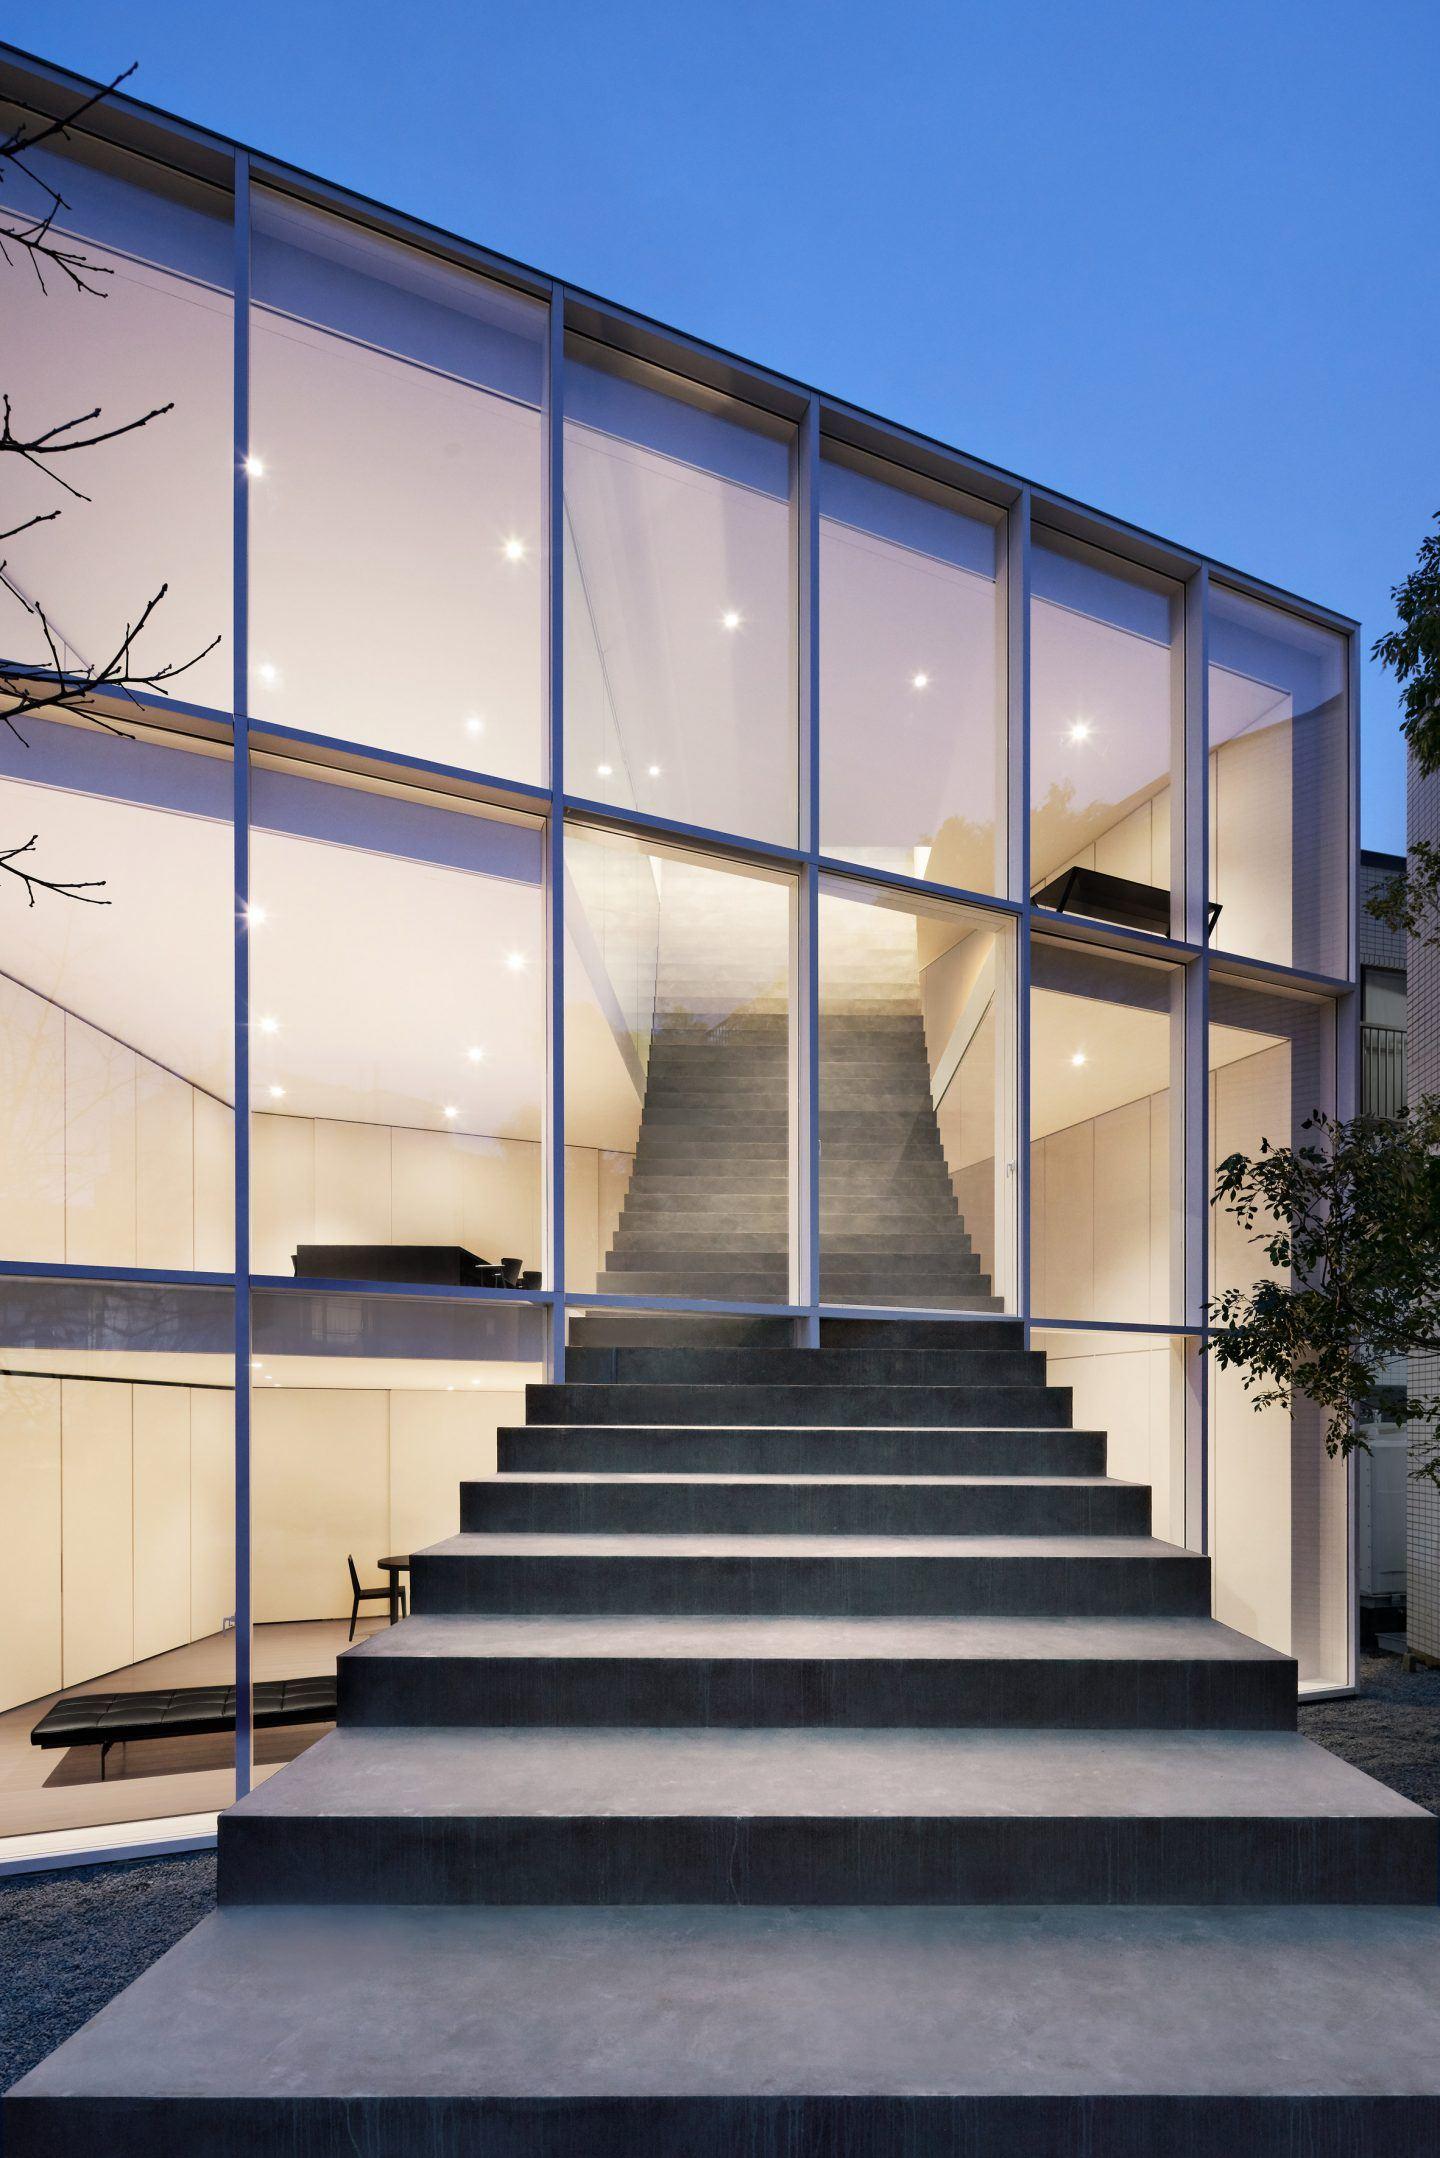 IGNANT-Architecture-Nendo-Stairway-House-011